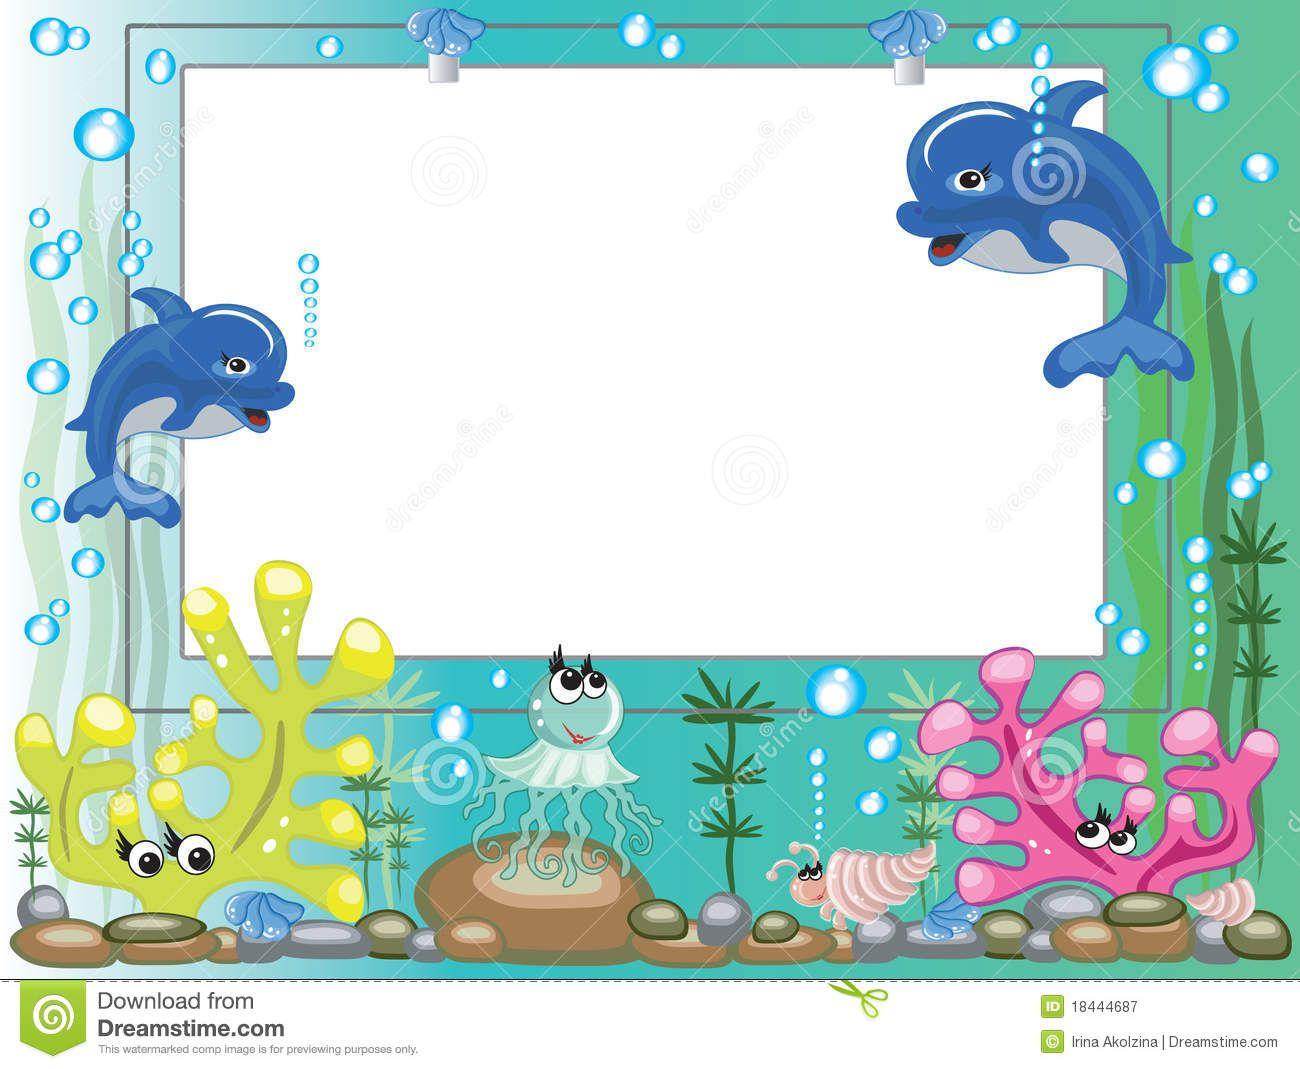 sea-frame-18444687.jpg (1300×1069) | VERANO SUMMER | Pinterest | Aula